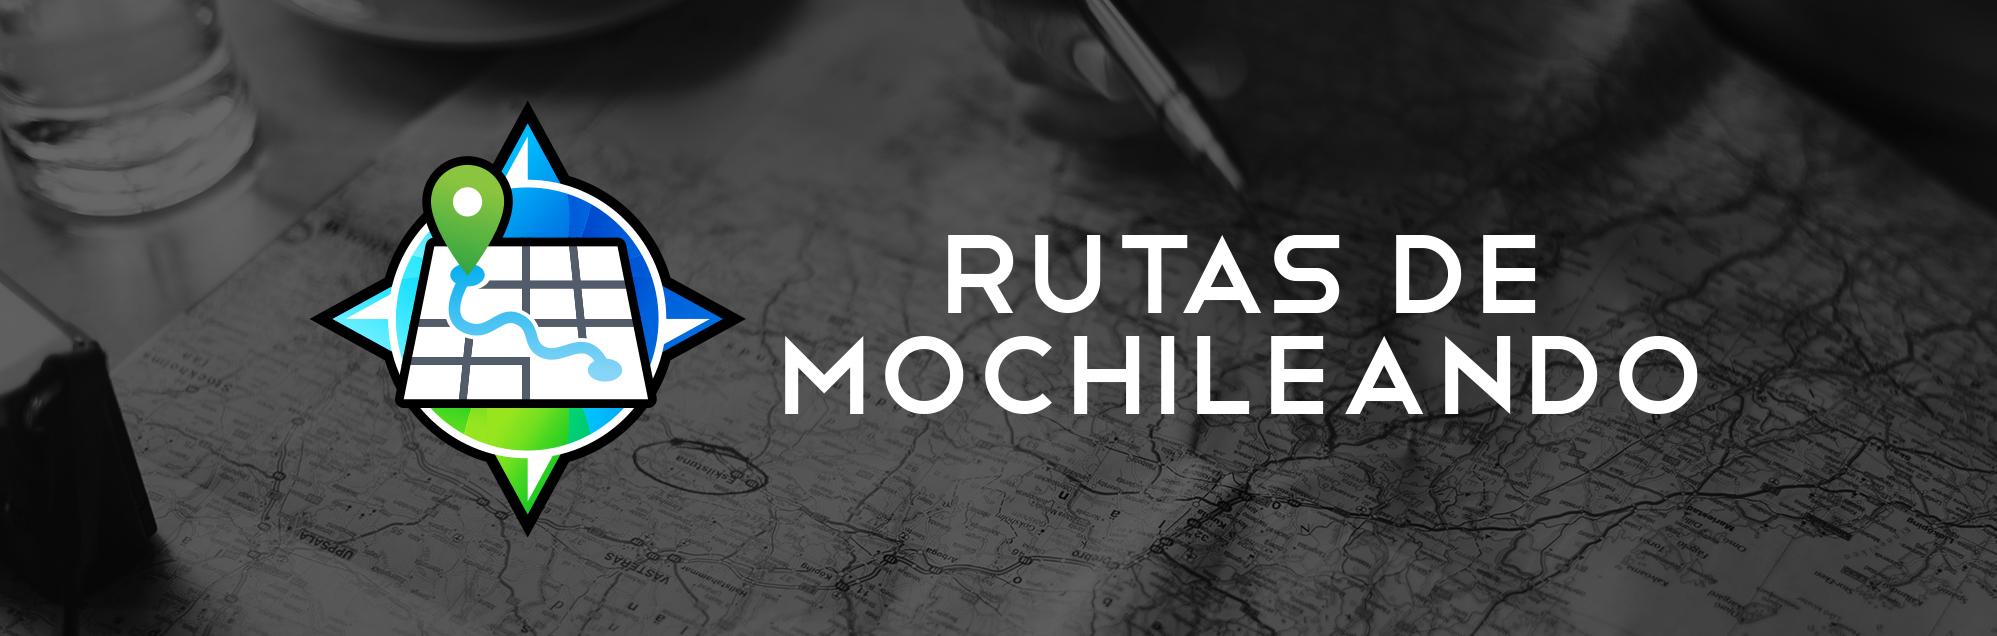 BOTON_Rutas_Mochileando.jpg